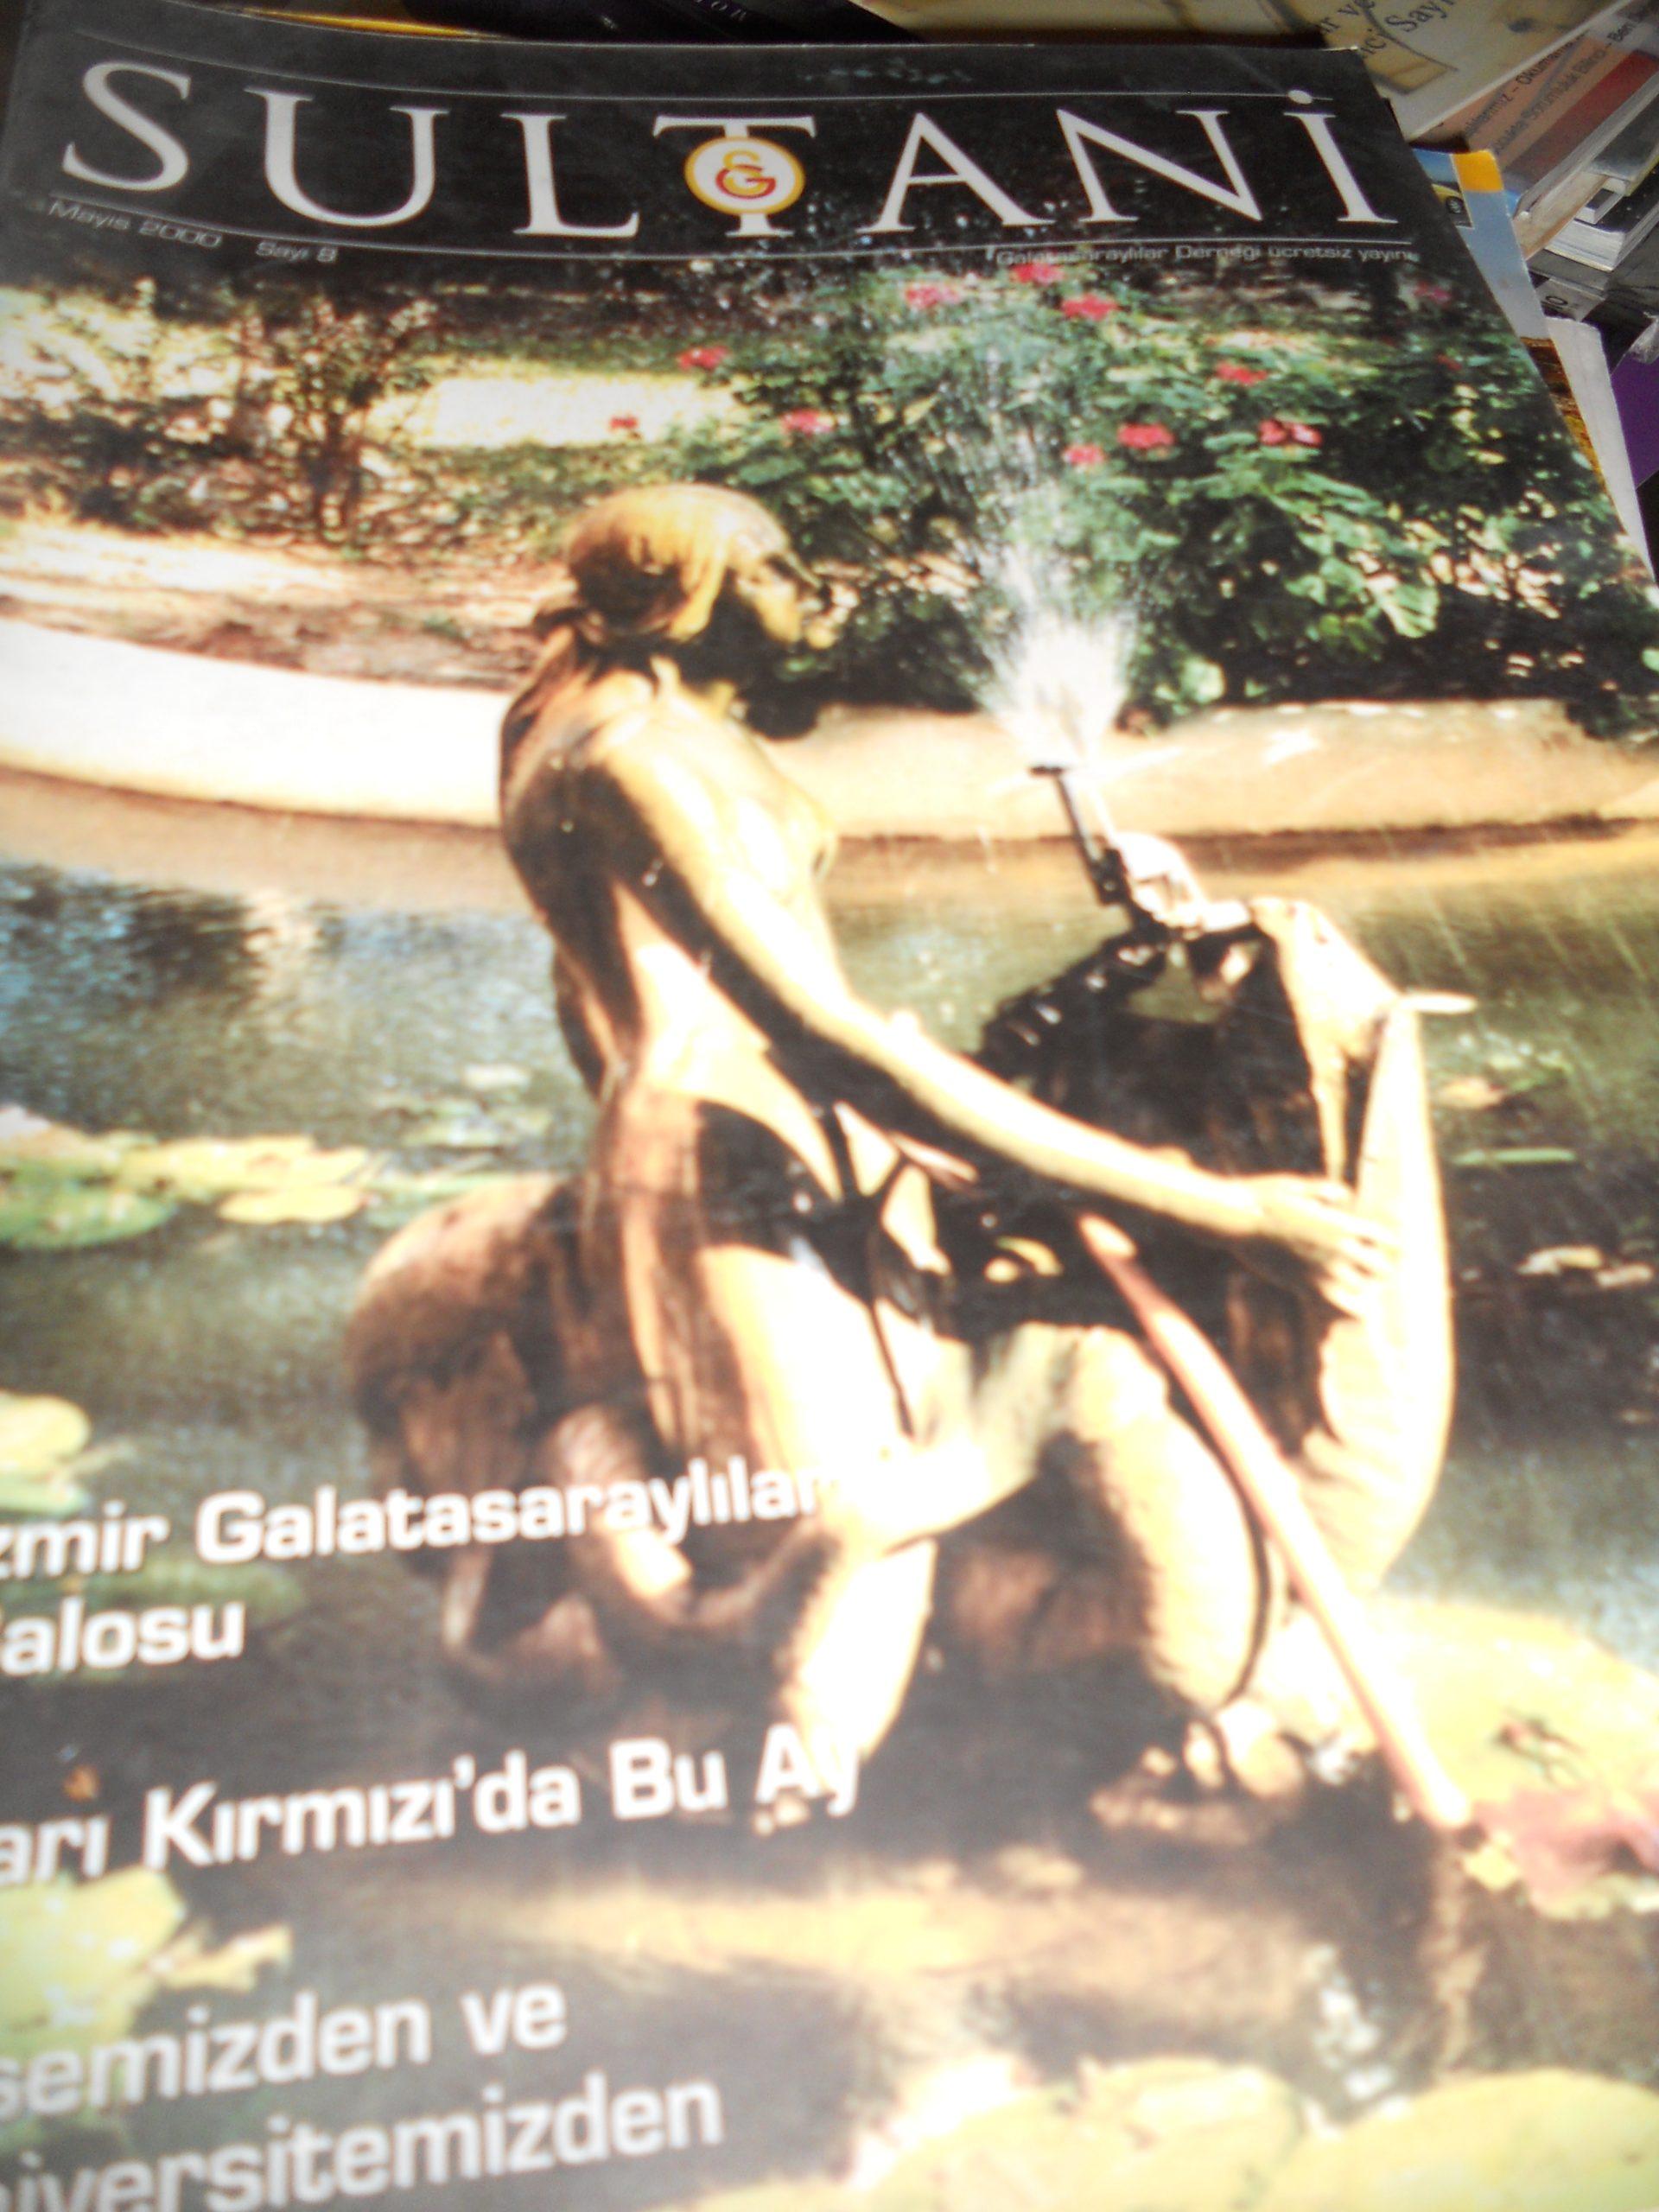 SULTANİ (Galatasaray lisesi dergisi 3 adet)+Galatasaray s.1 1995/4 dergi toplam:20 tl